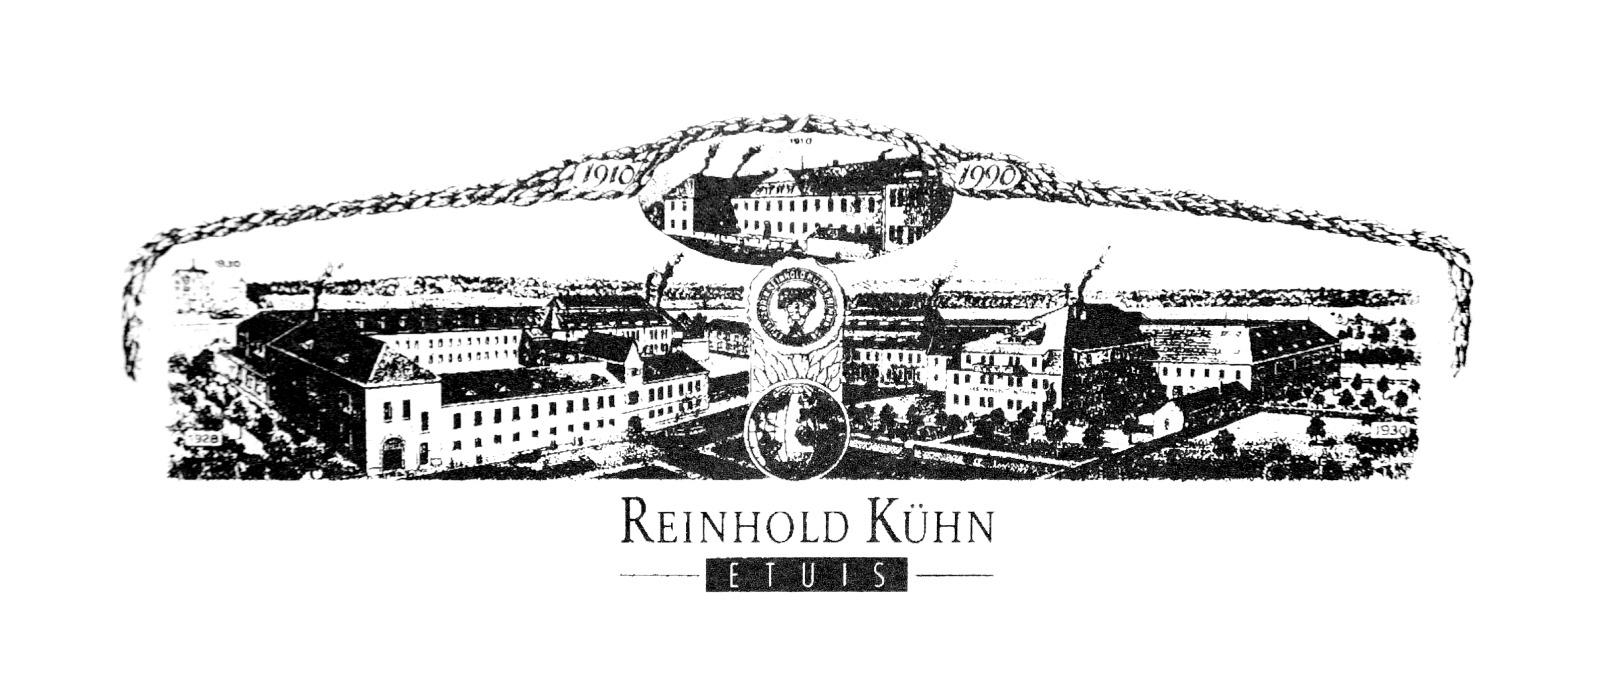 REINHOLD KÜHN / ラインホルト キューン